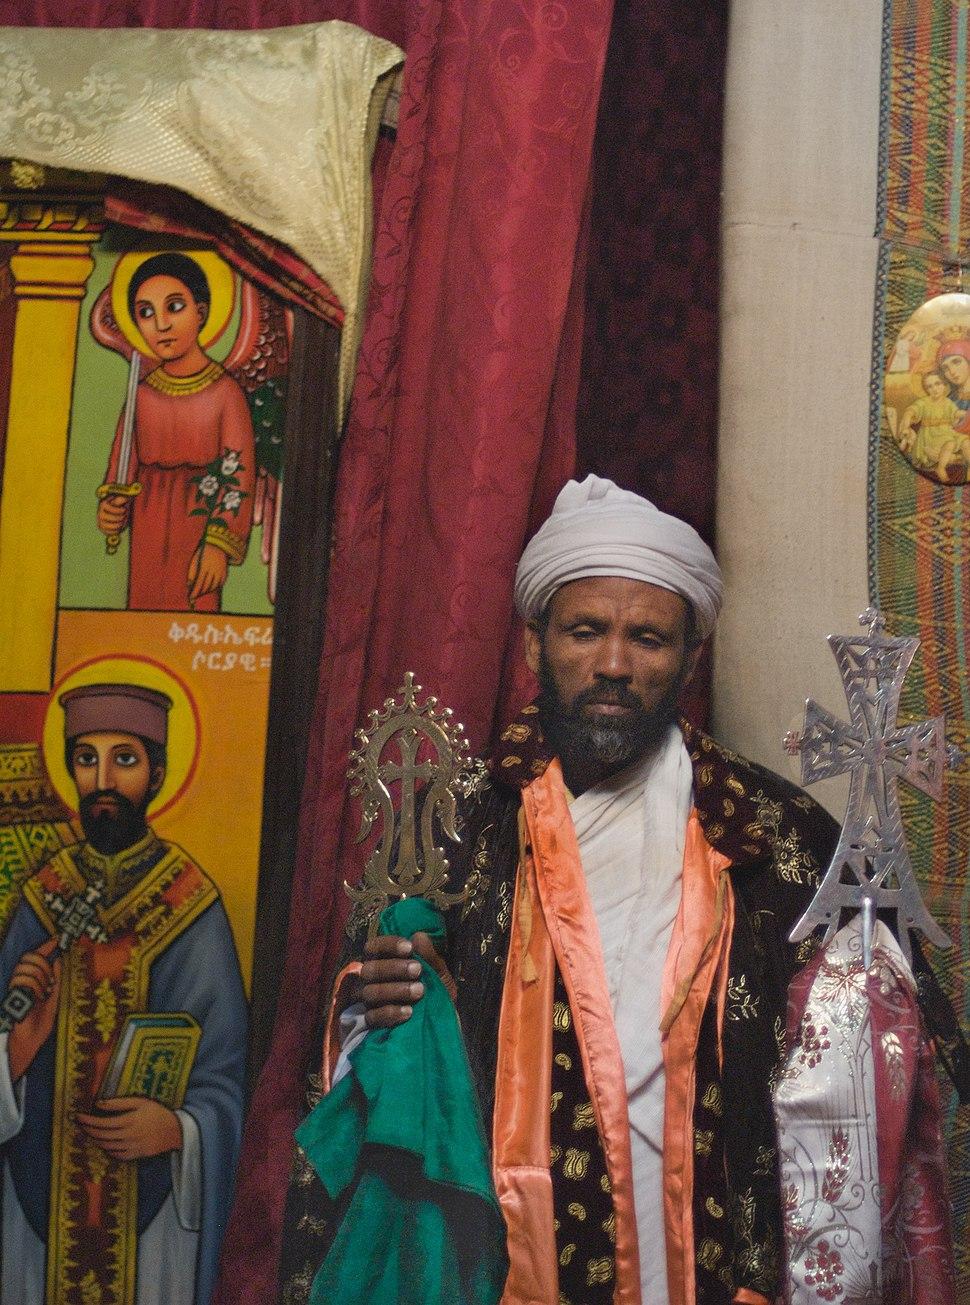 Display of Procesional Crosses, Church of Bet Maryam, Lalibela, Ethiopia (3230772118)